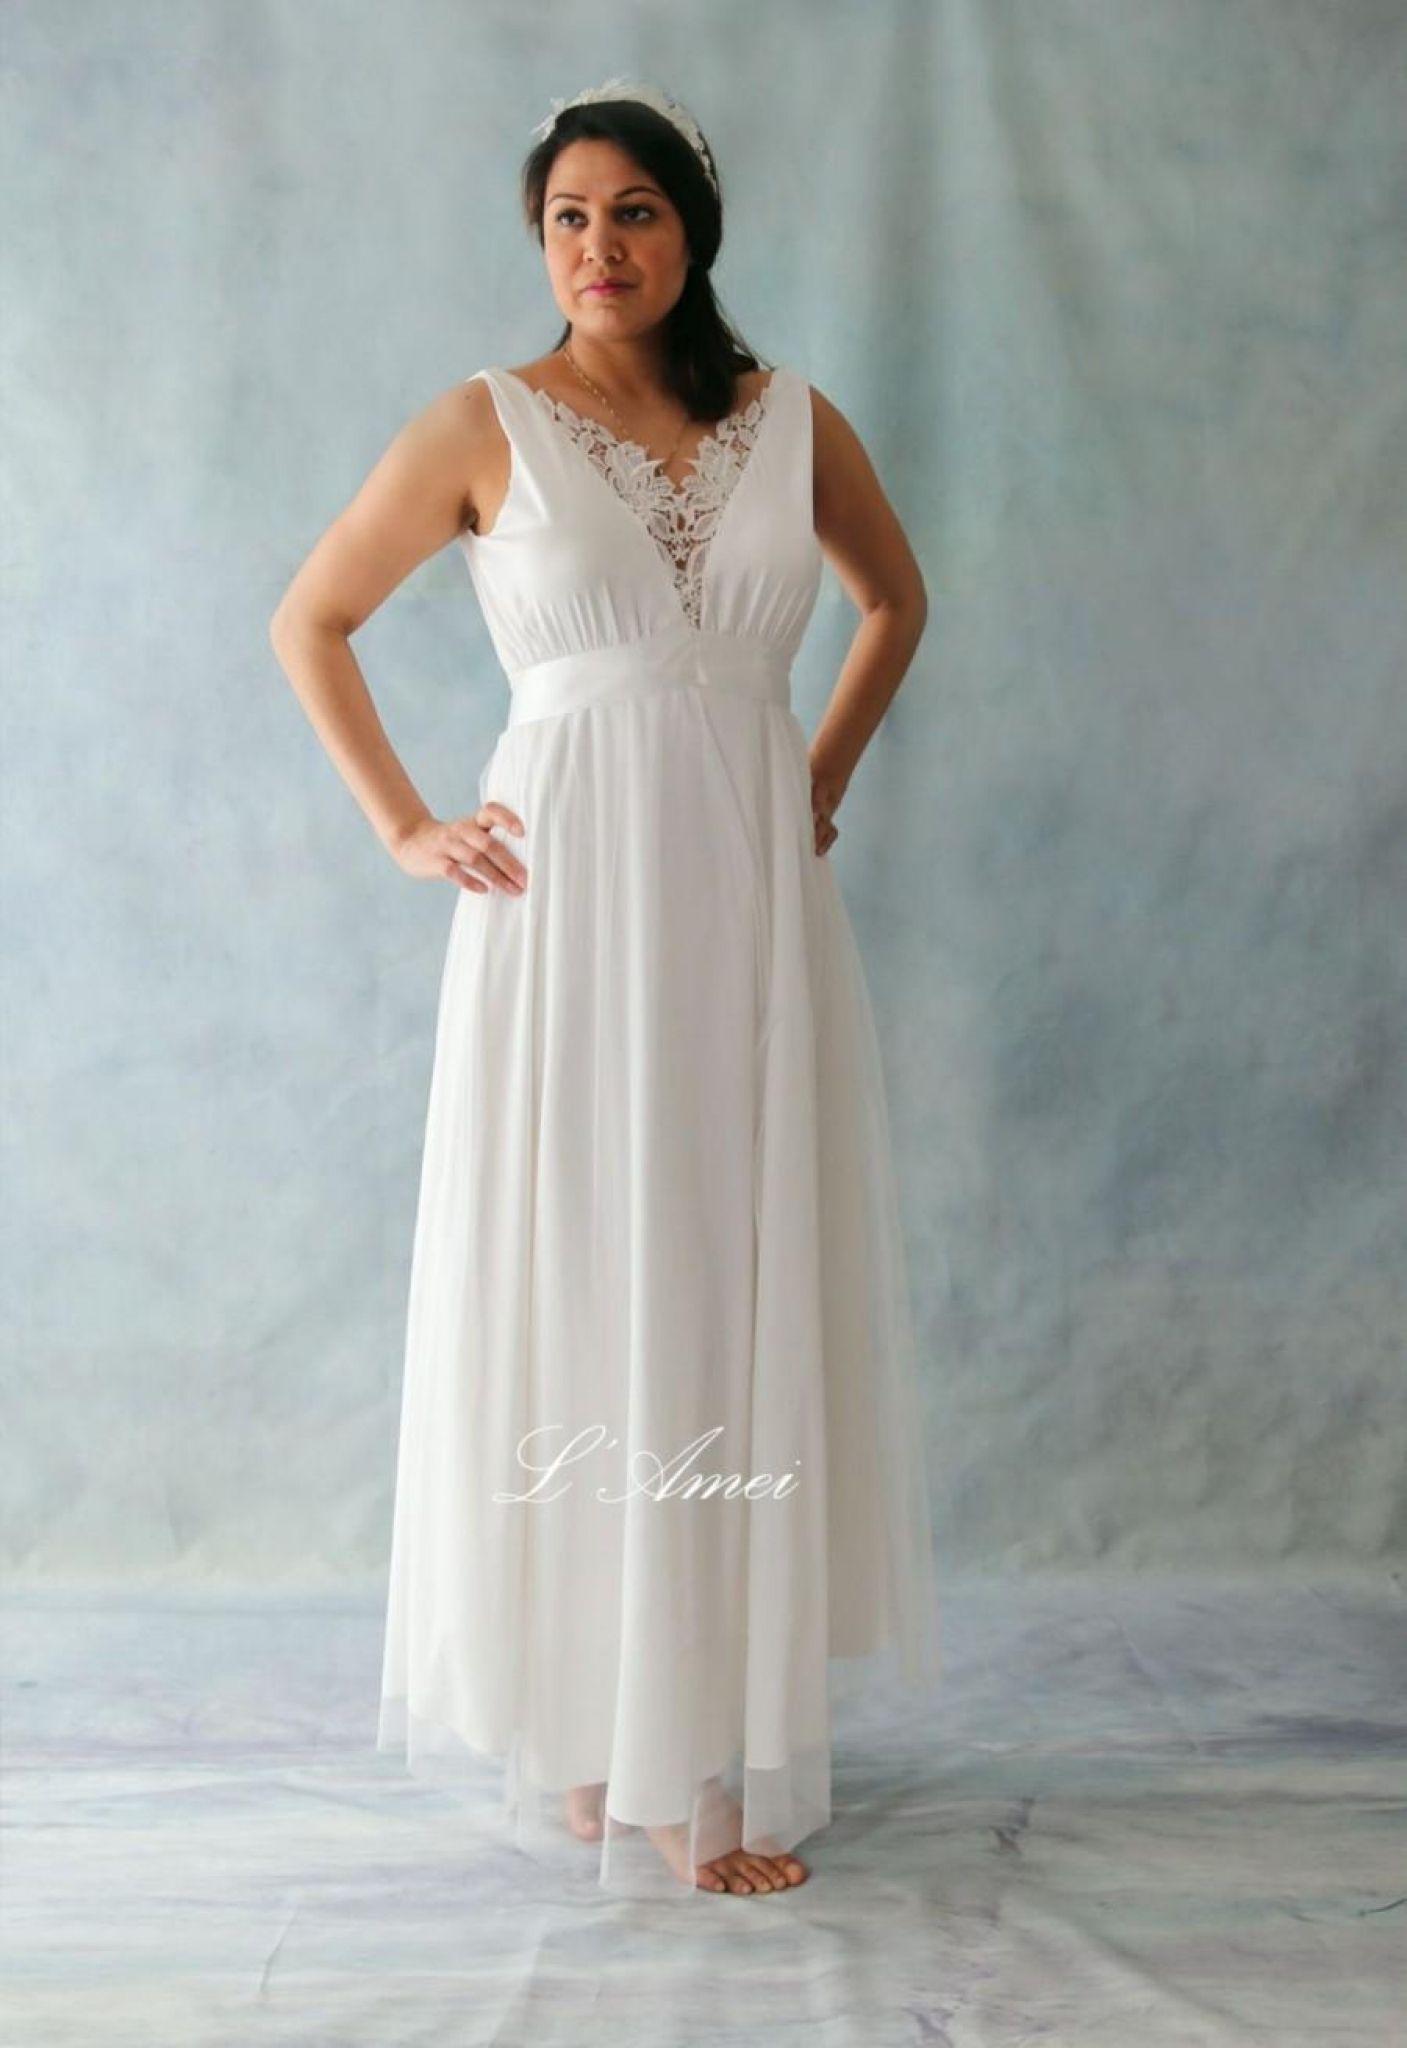 Cotton simple wedding dresses